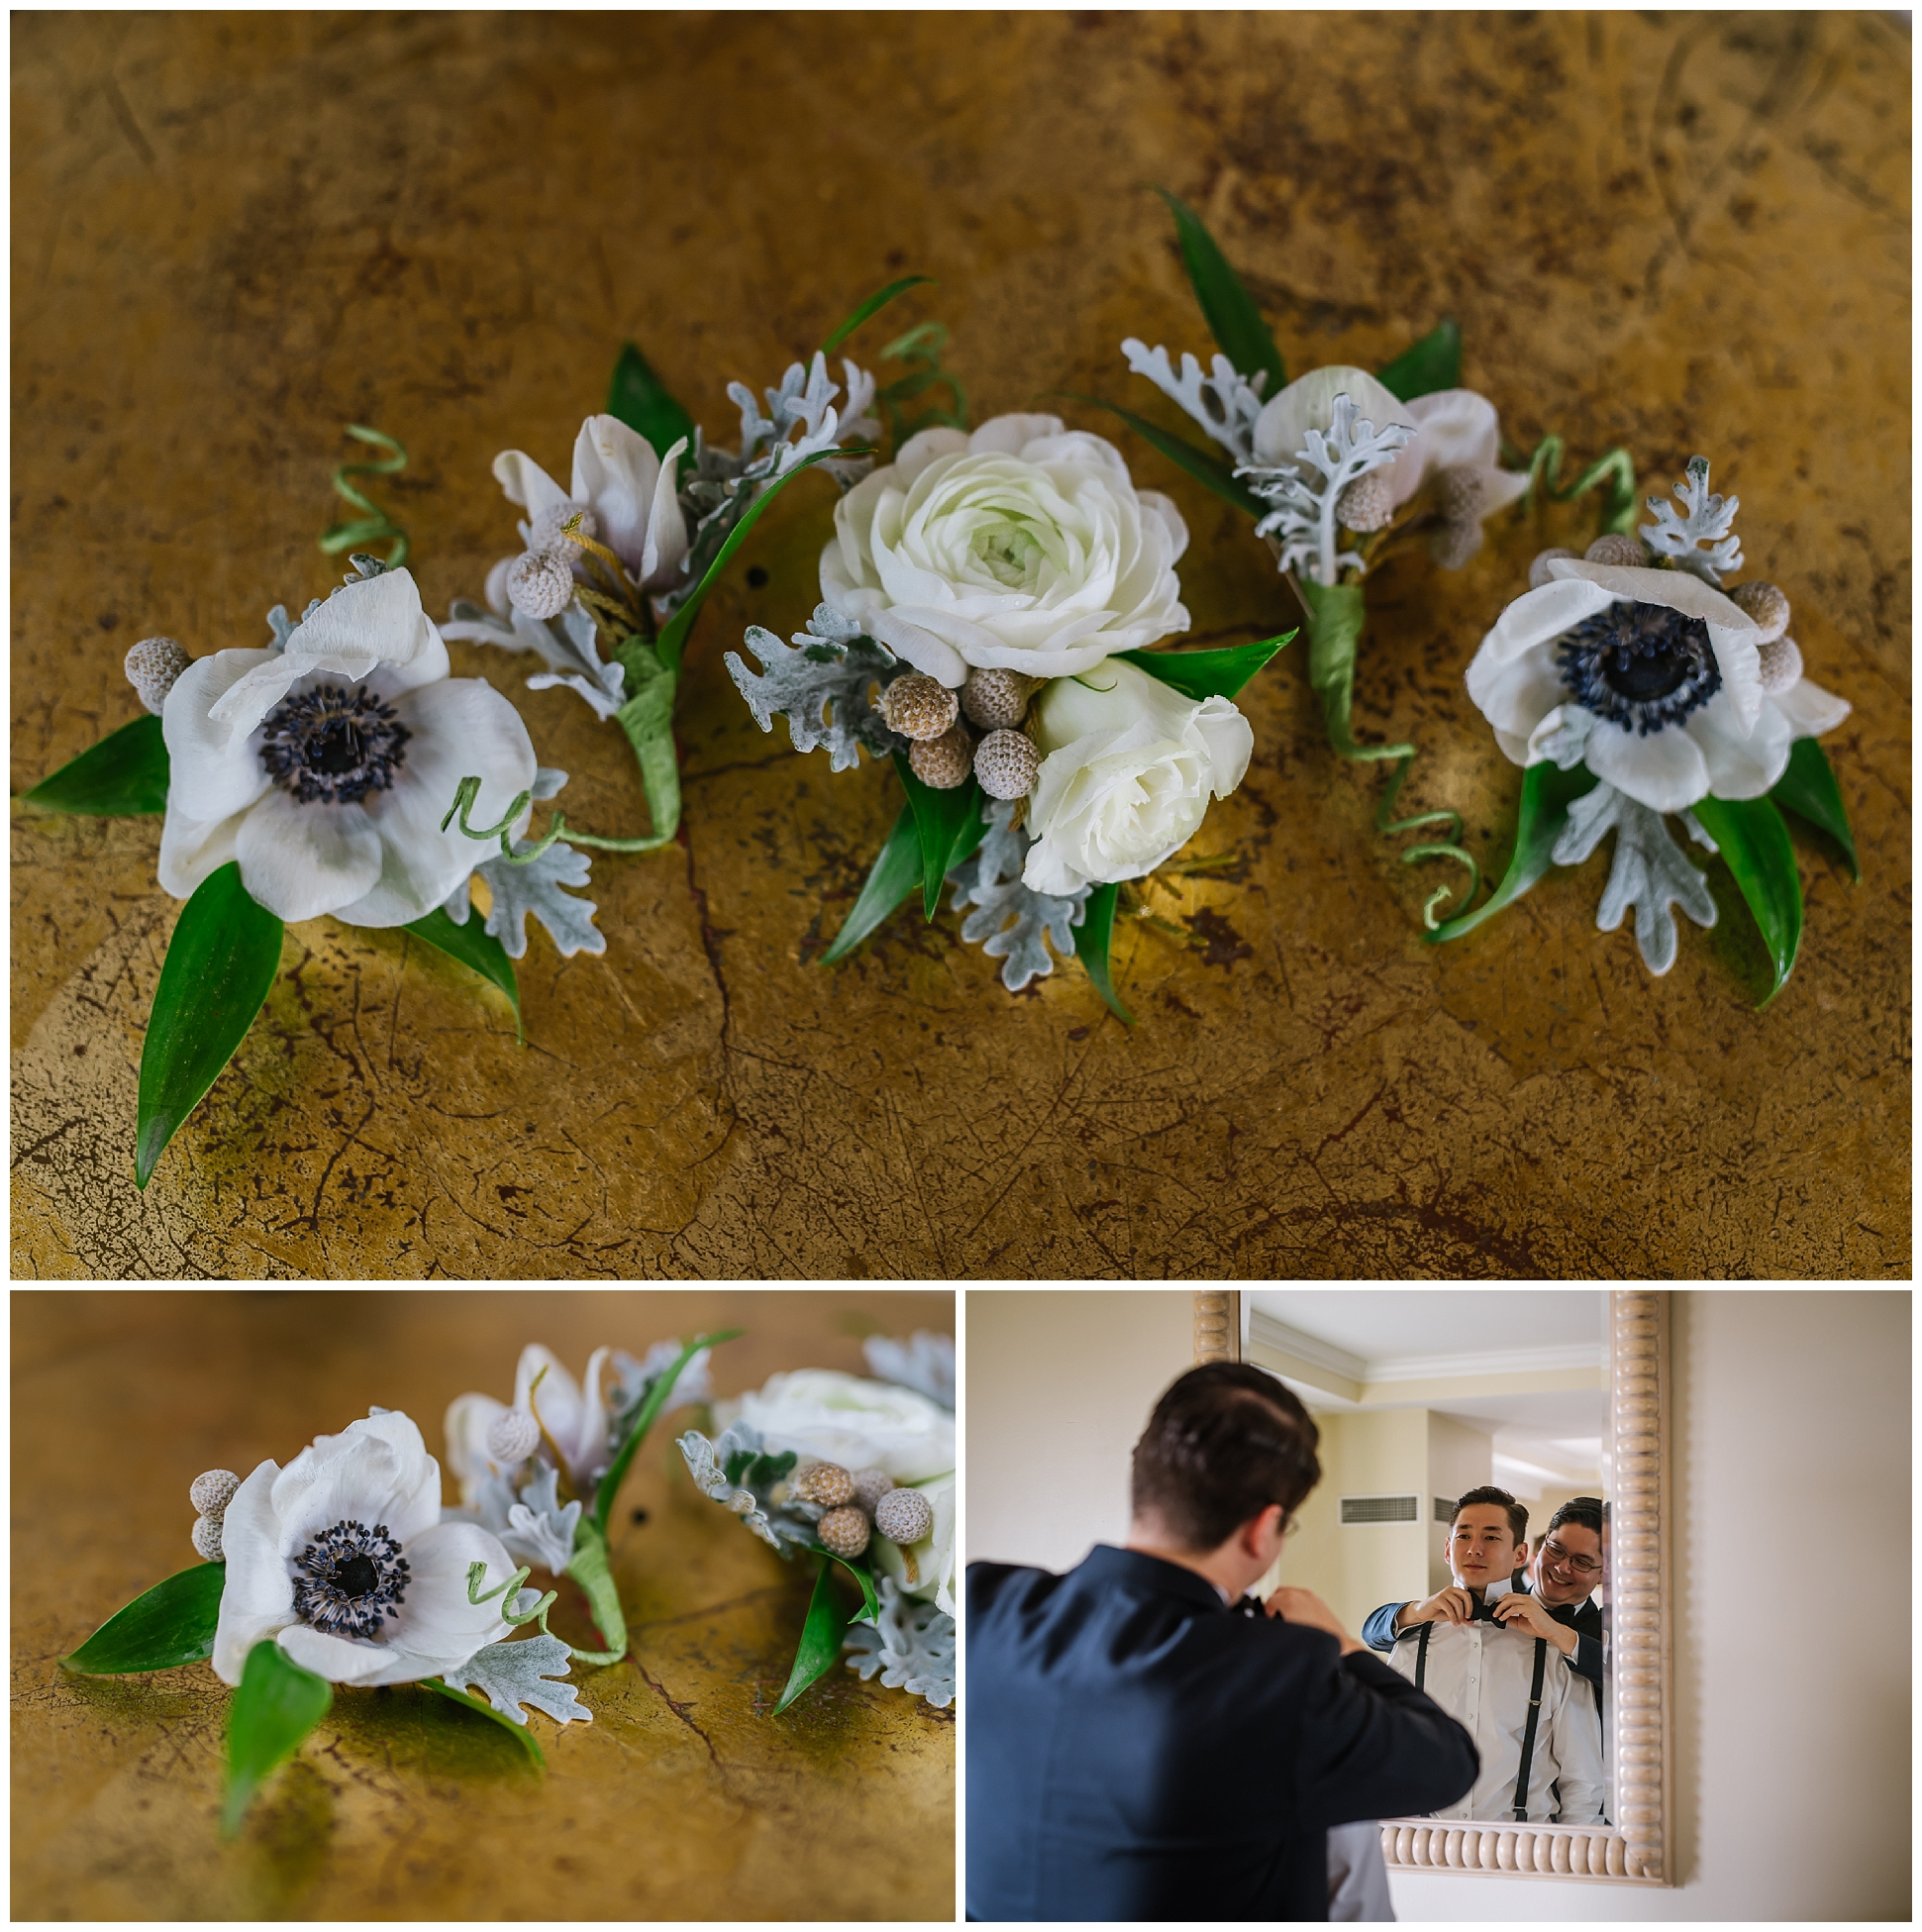 st-pete-wedding-photographer-italian-romance-theme-rustic-flower-crown_0351.jpg